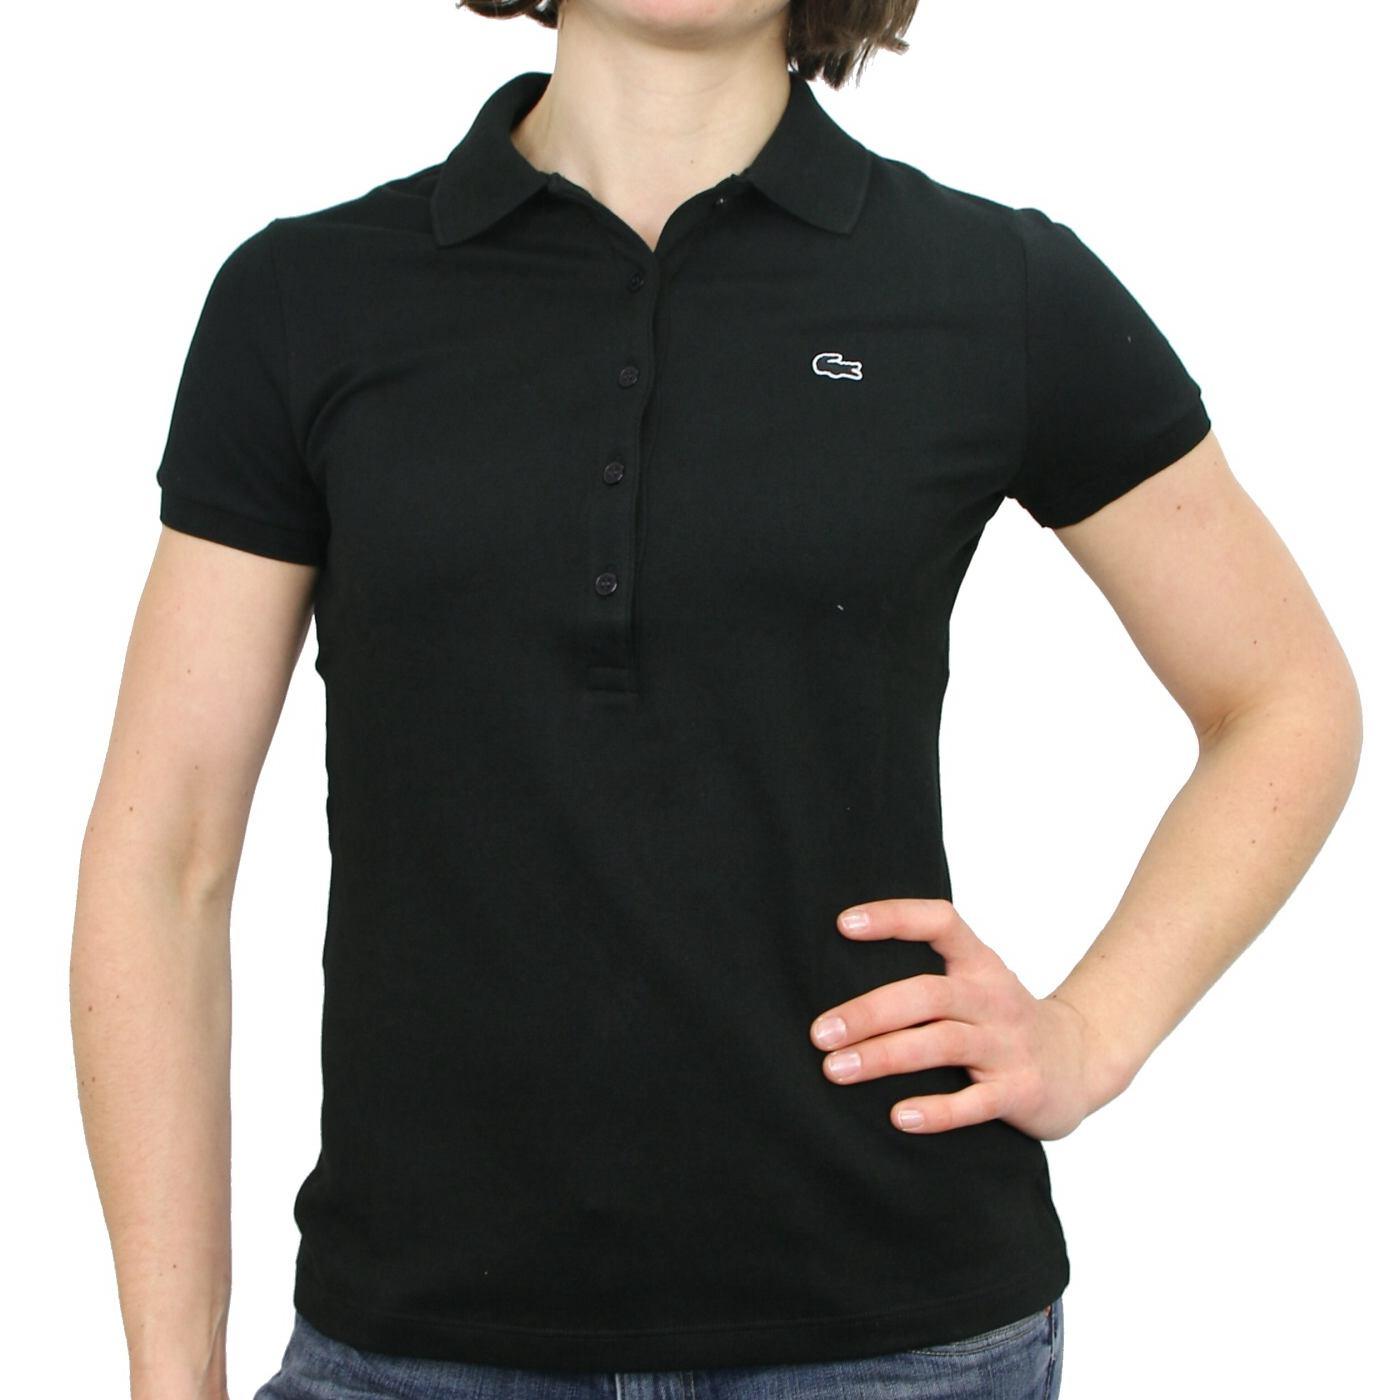 lacoste polo shirt polo t shirt baumwollstretch short. Black Bedroom Furniture Sets. Home Design Ideas